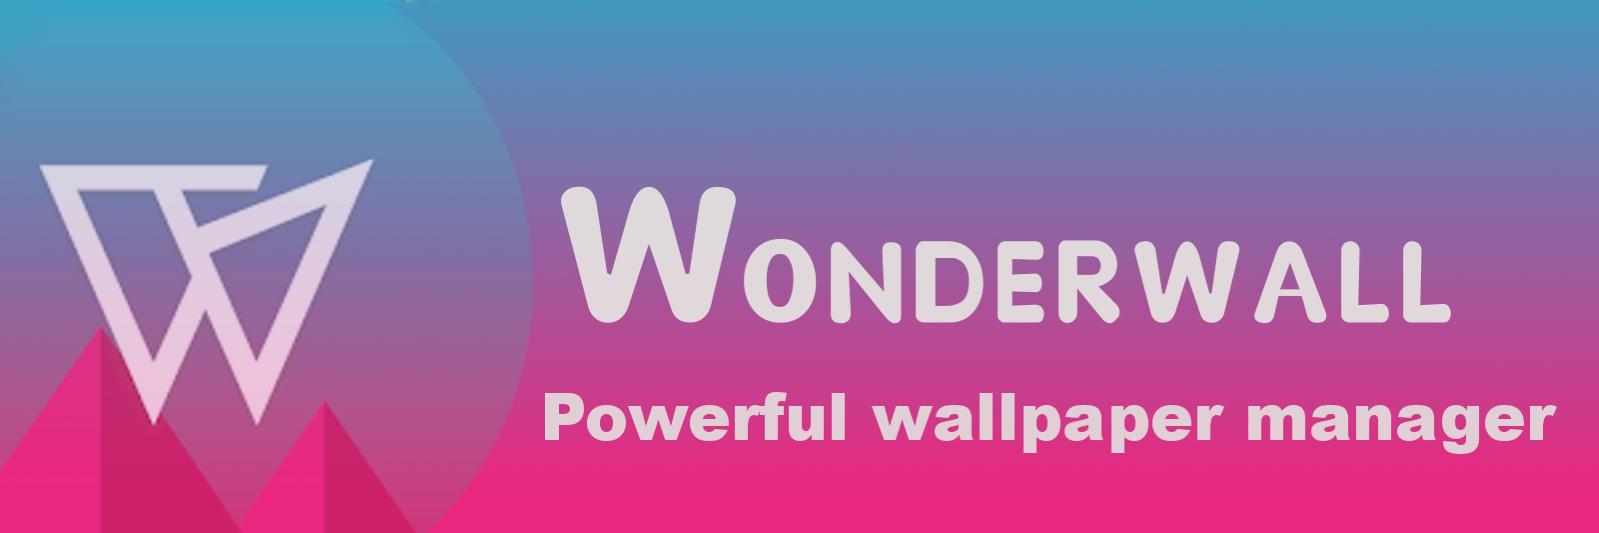 Wonderwall - Wallpaper Manager banner